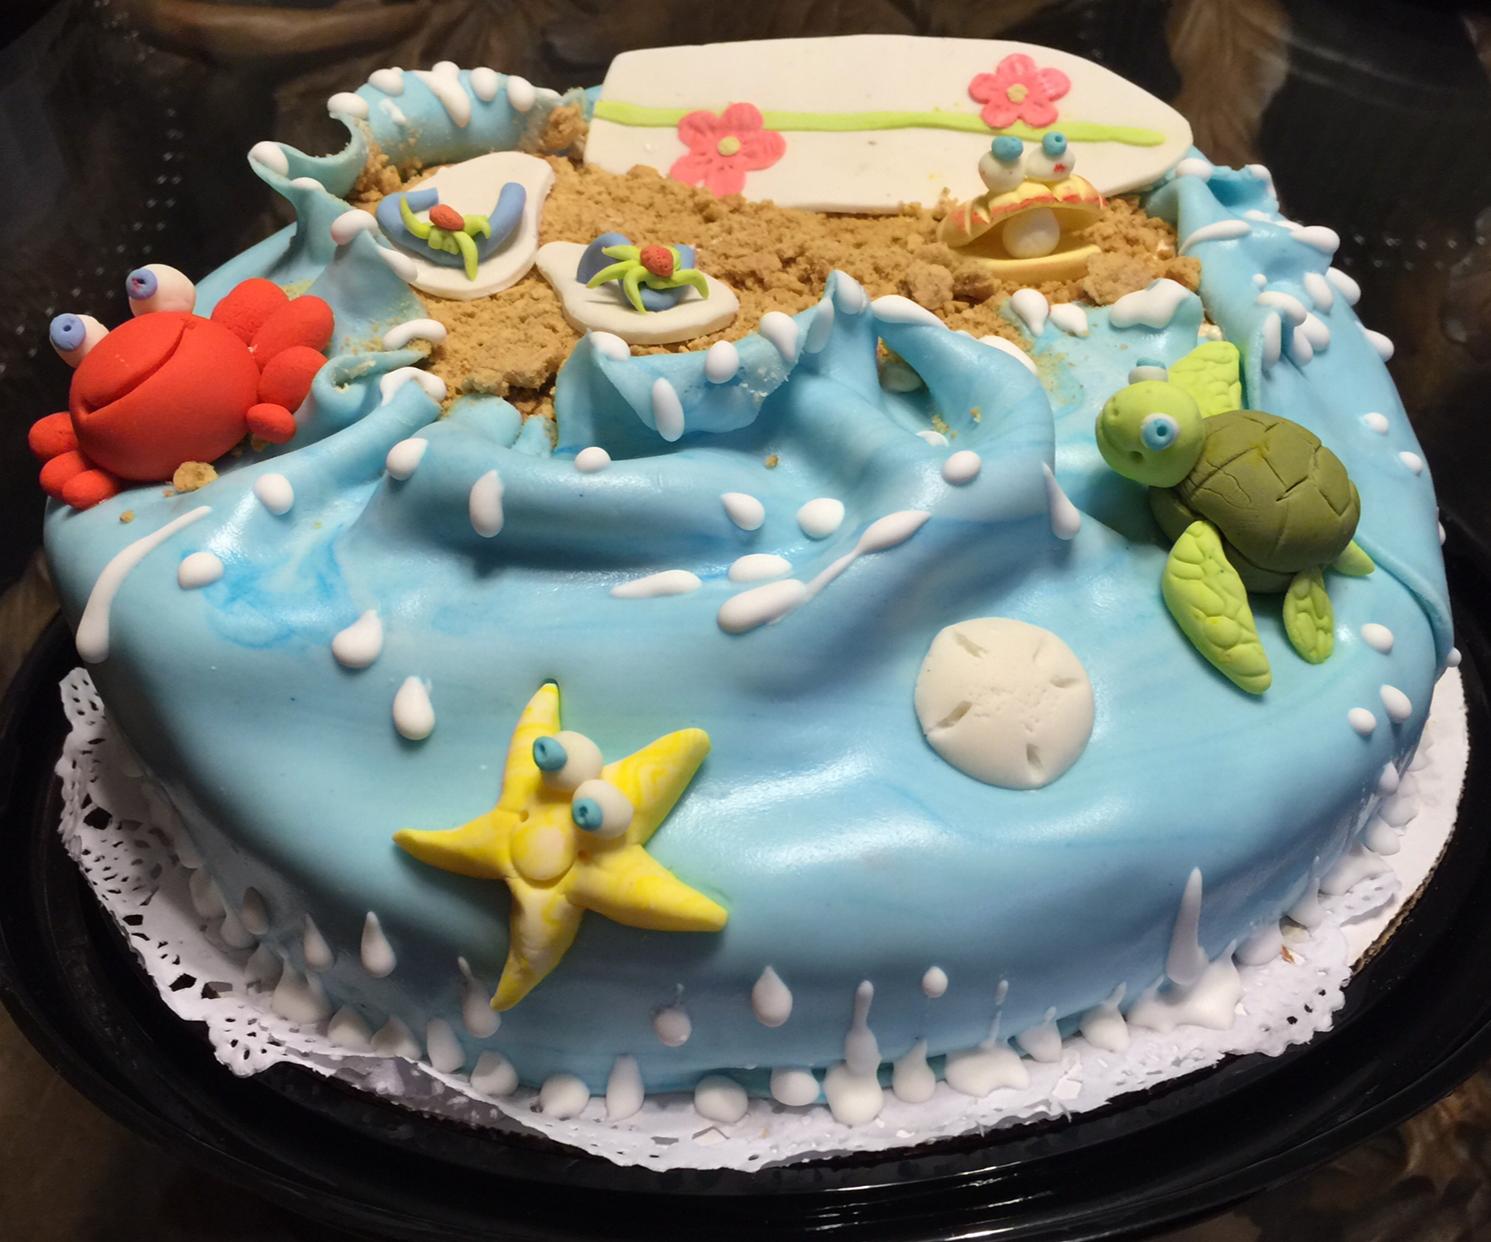 Life's a Beach! A Free-Hand Cake Decorating